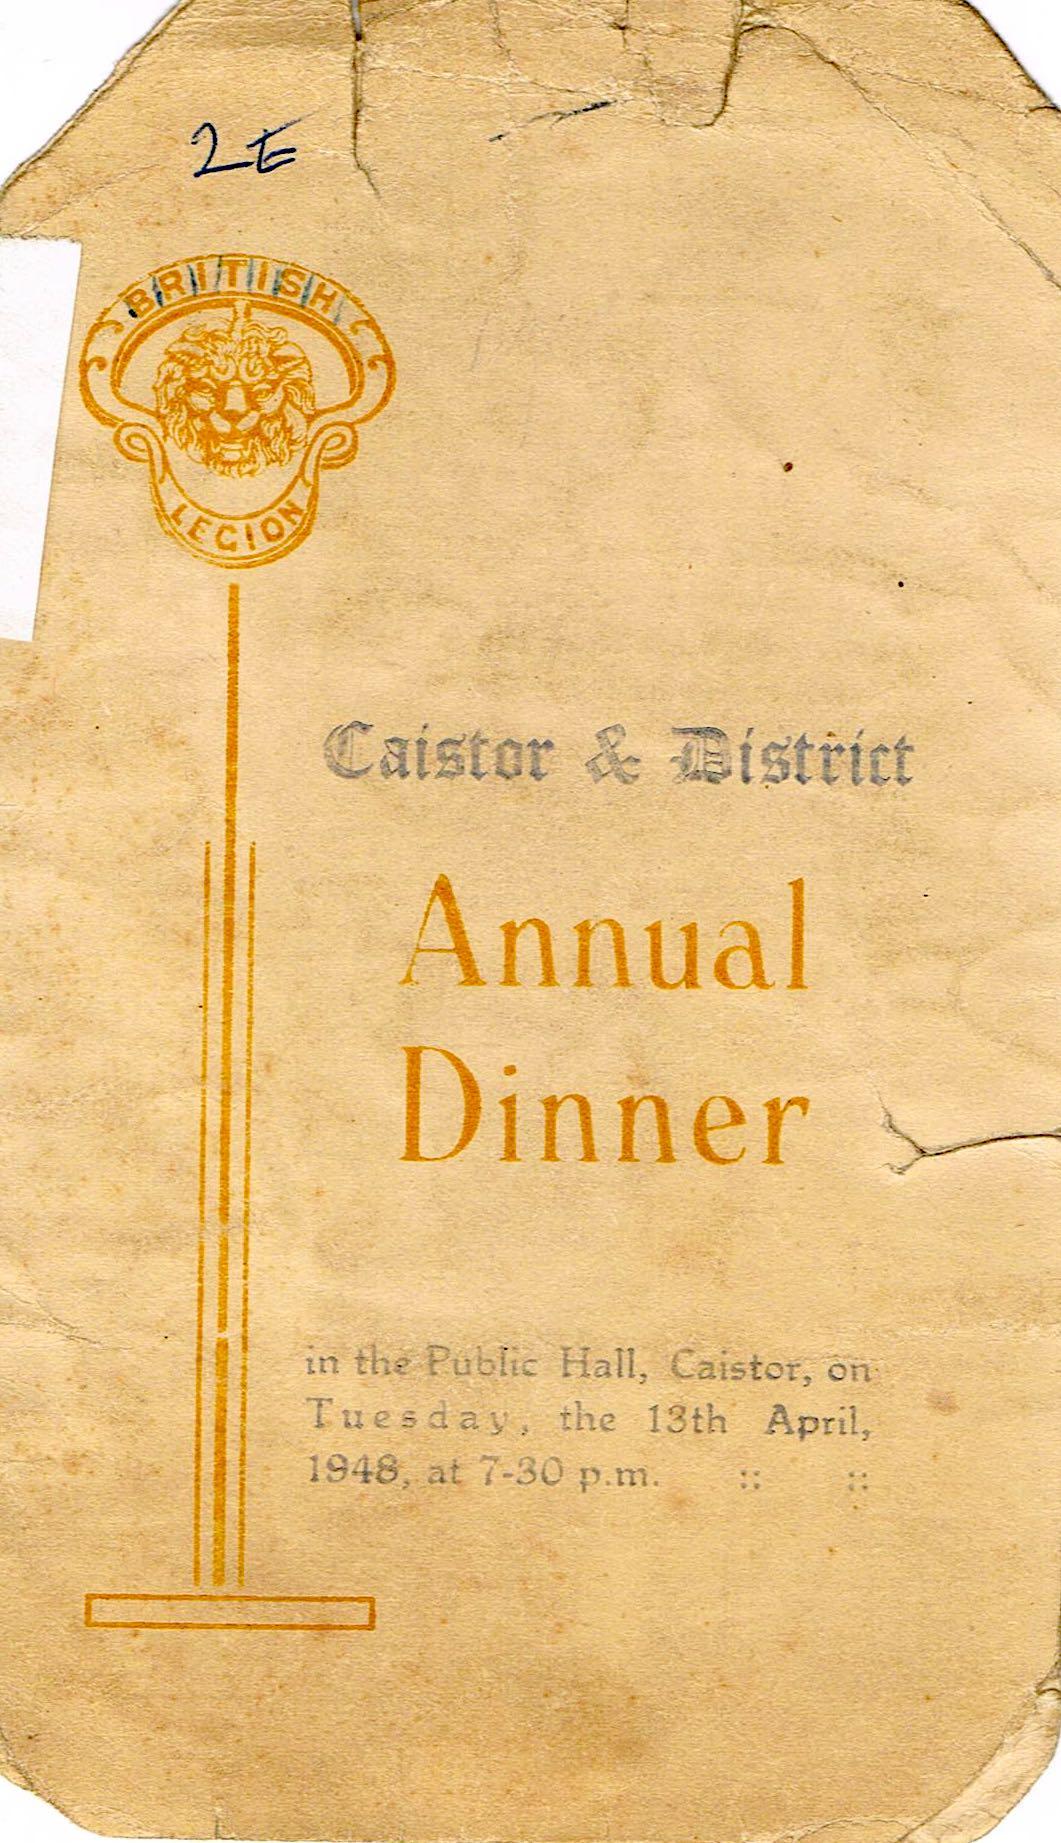 1948 Annual Dinner a.jpg